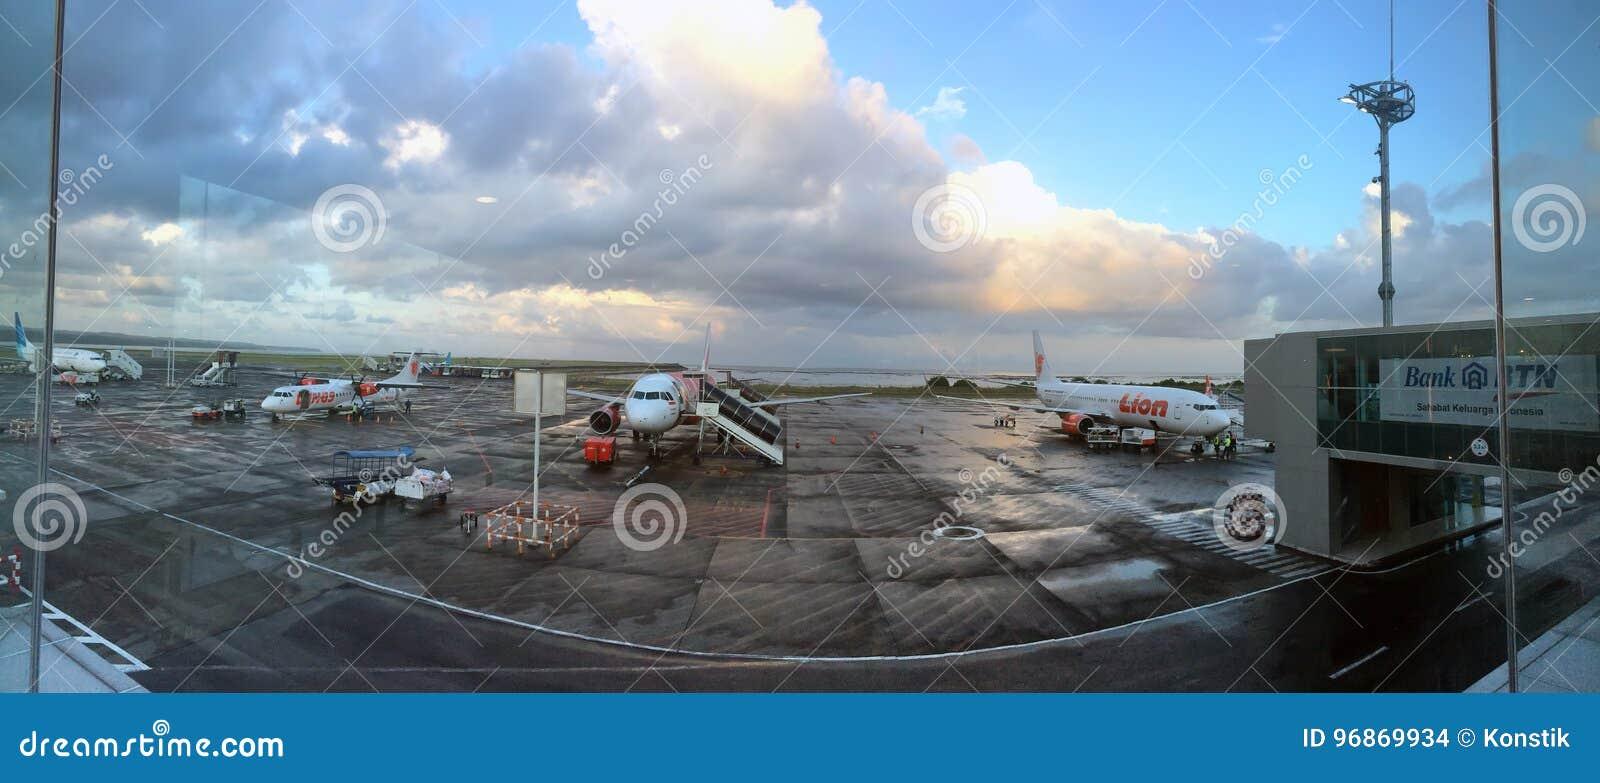 BALI 19 OKTOBER, 2016: Vliegtuigen bij de luchthaven Denpasar, Bali, Indonesië